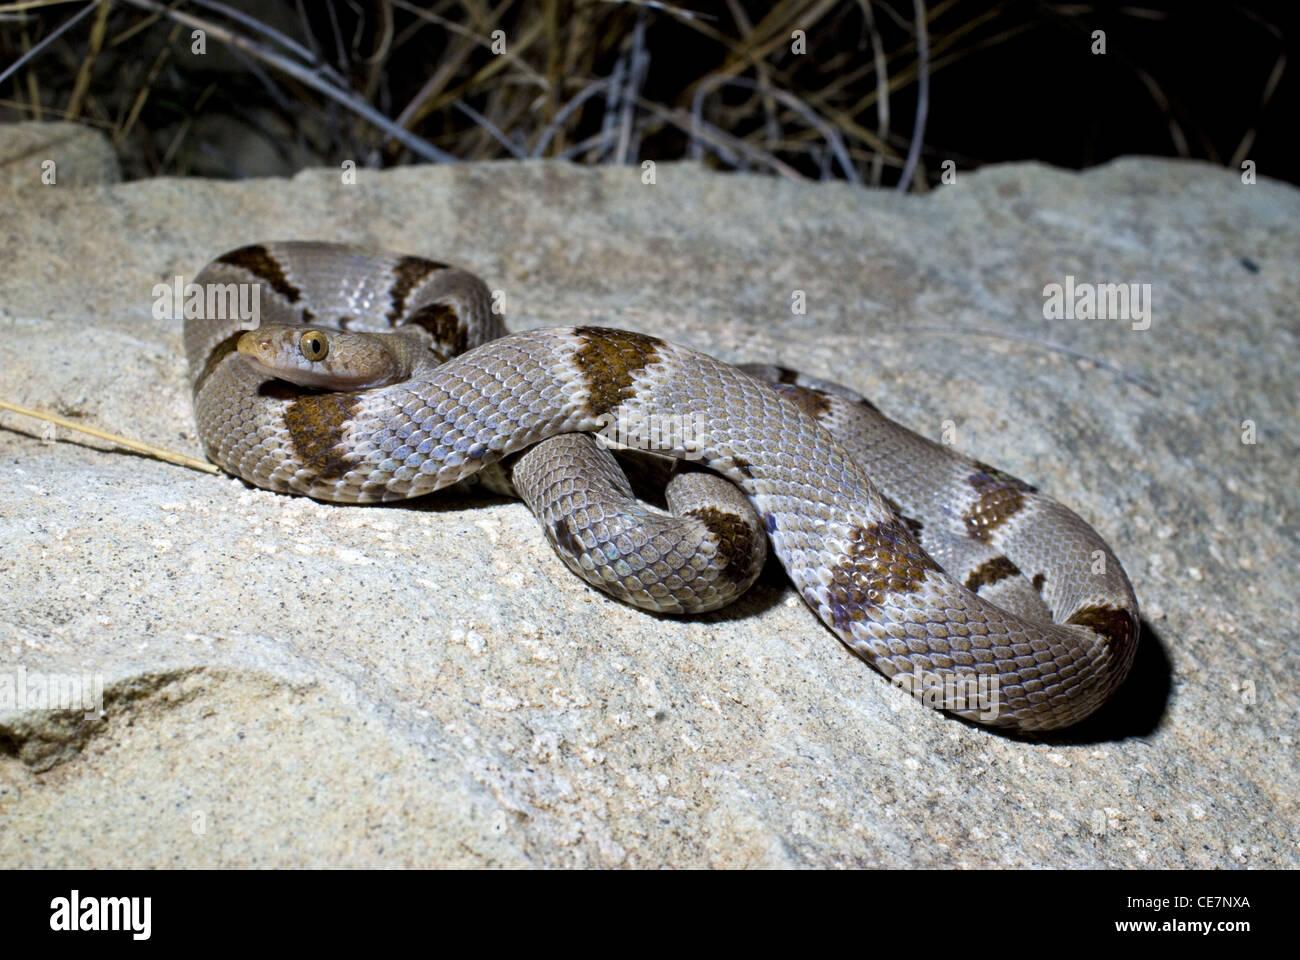 Chihuahuan Lyre Snake, (Trimorphodon vilkinsonii), Sierra county, New Mexico, USA. - Stock Image